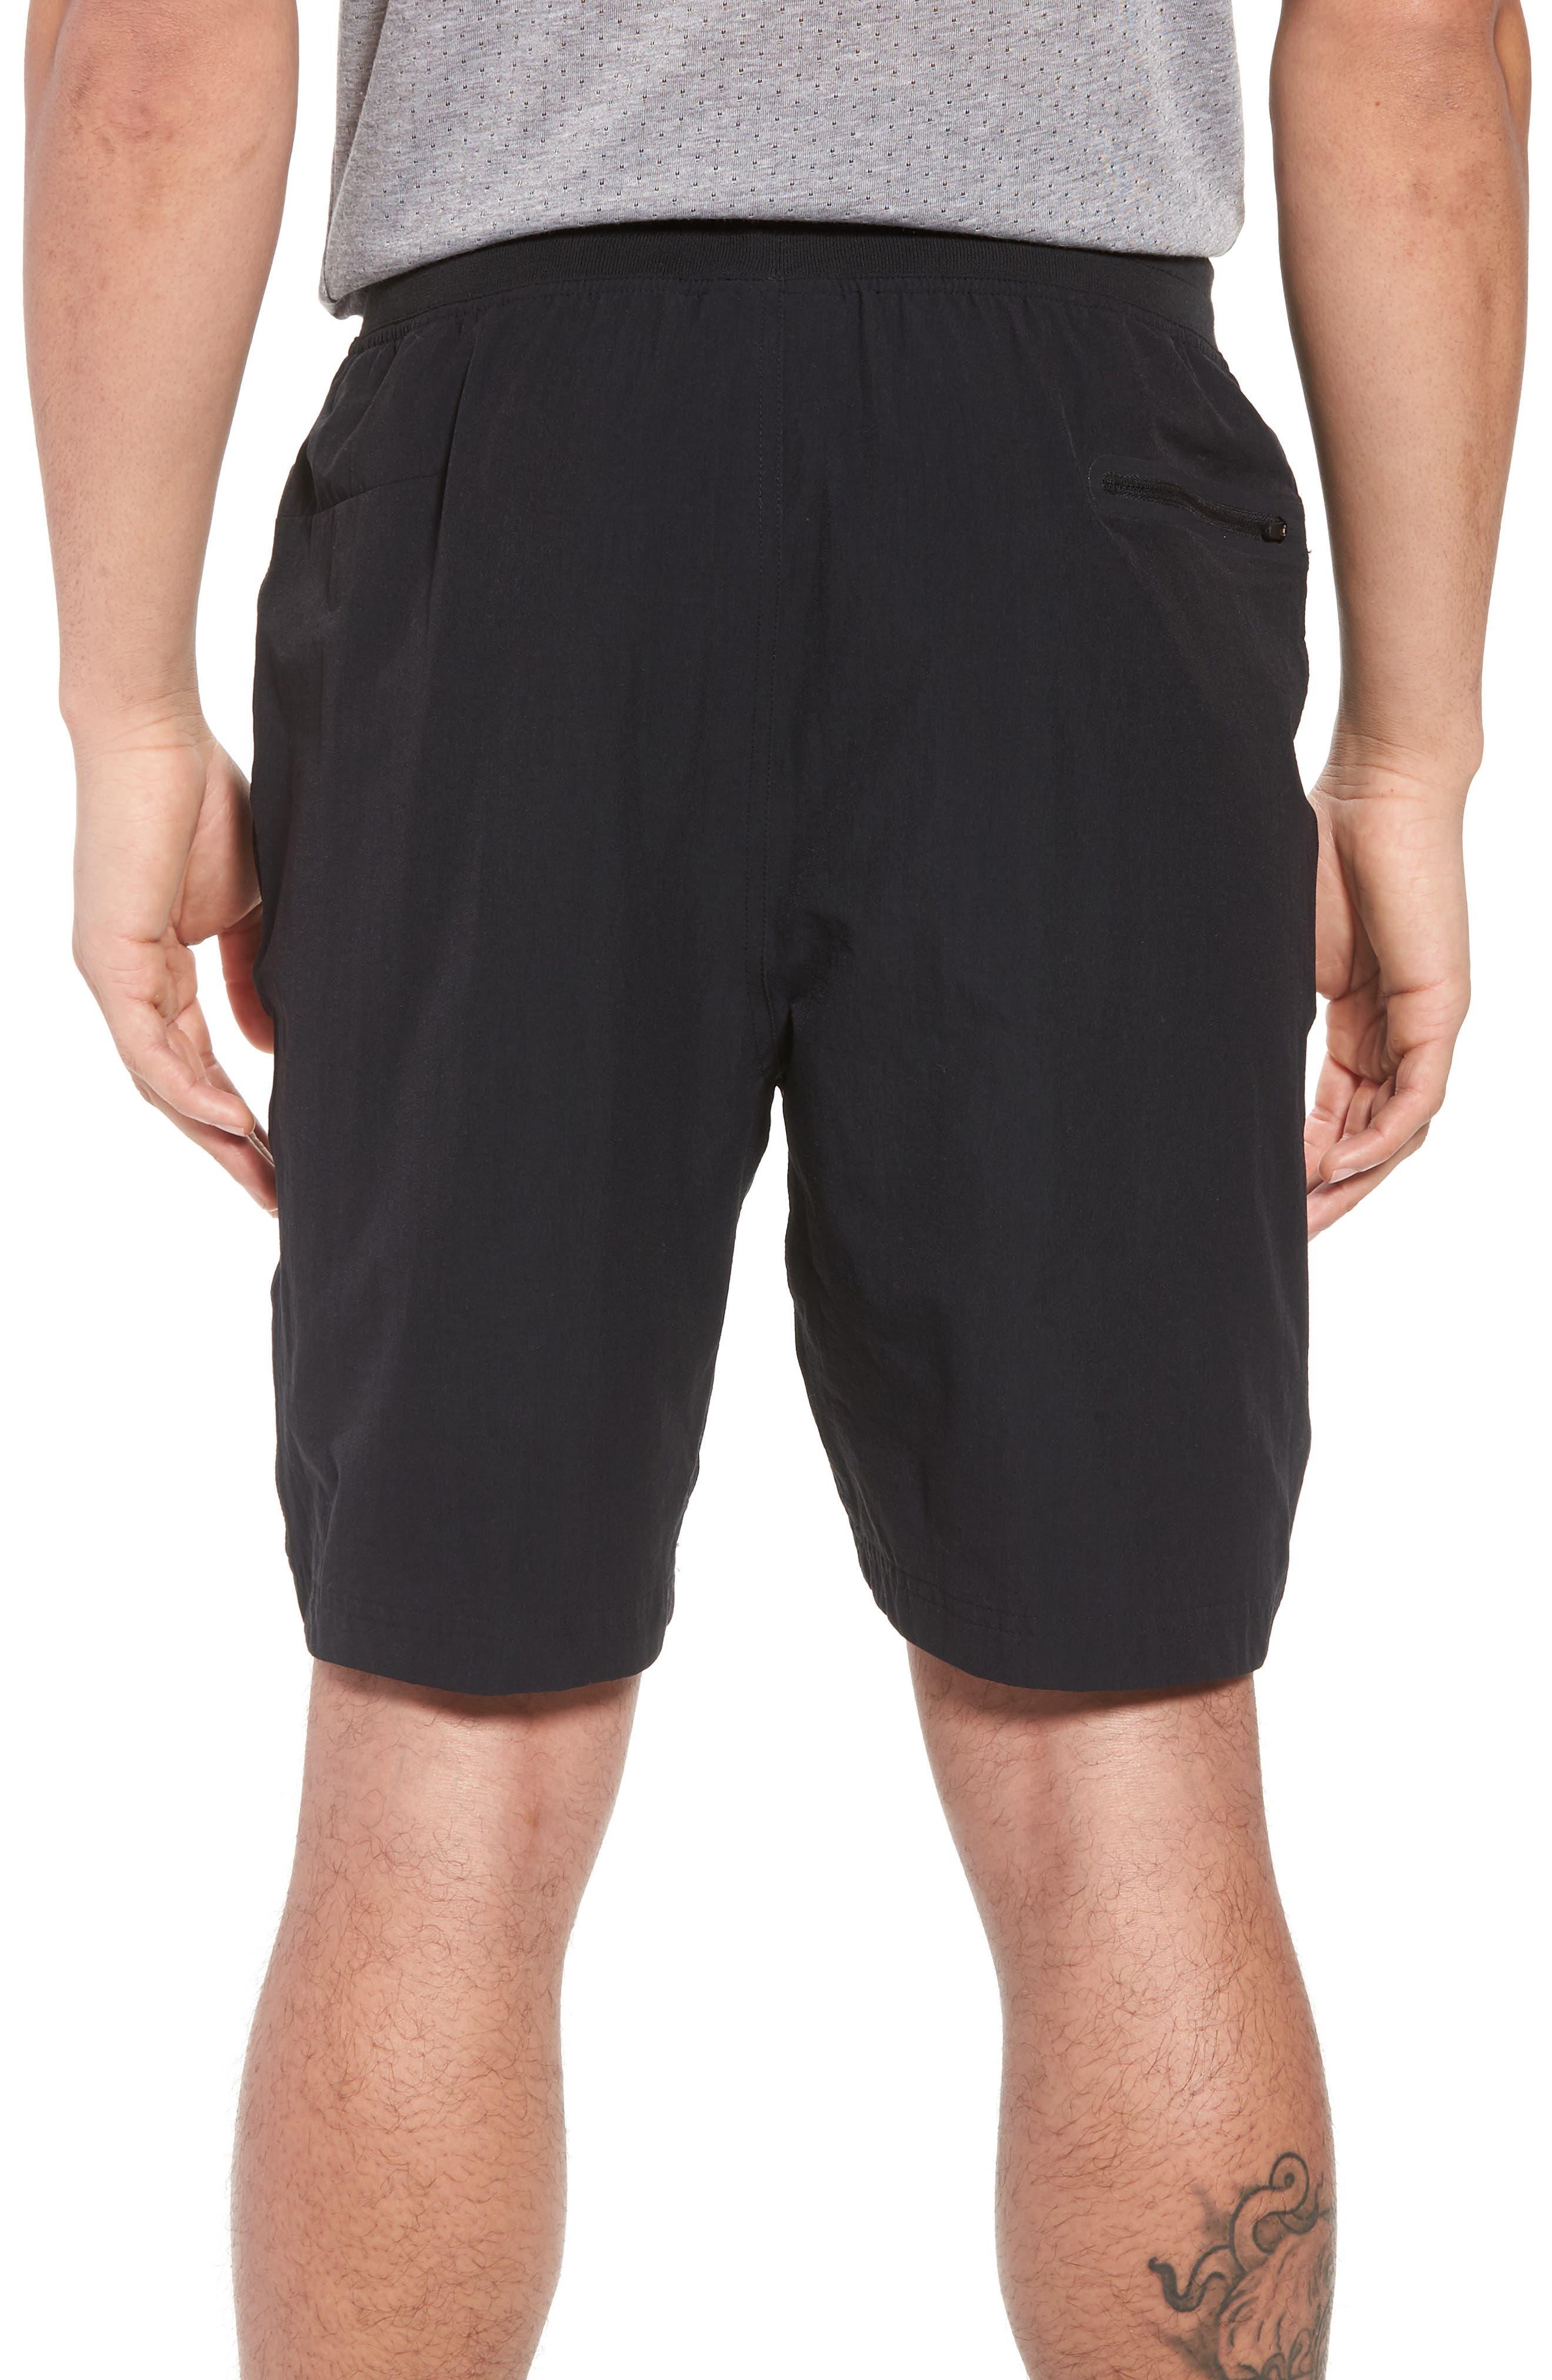 Sportswear Woven Shorts,                             Alternate thumbnail 2, color,                             Black/ Black